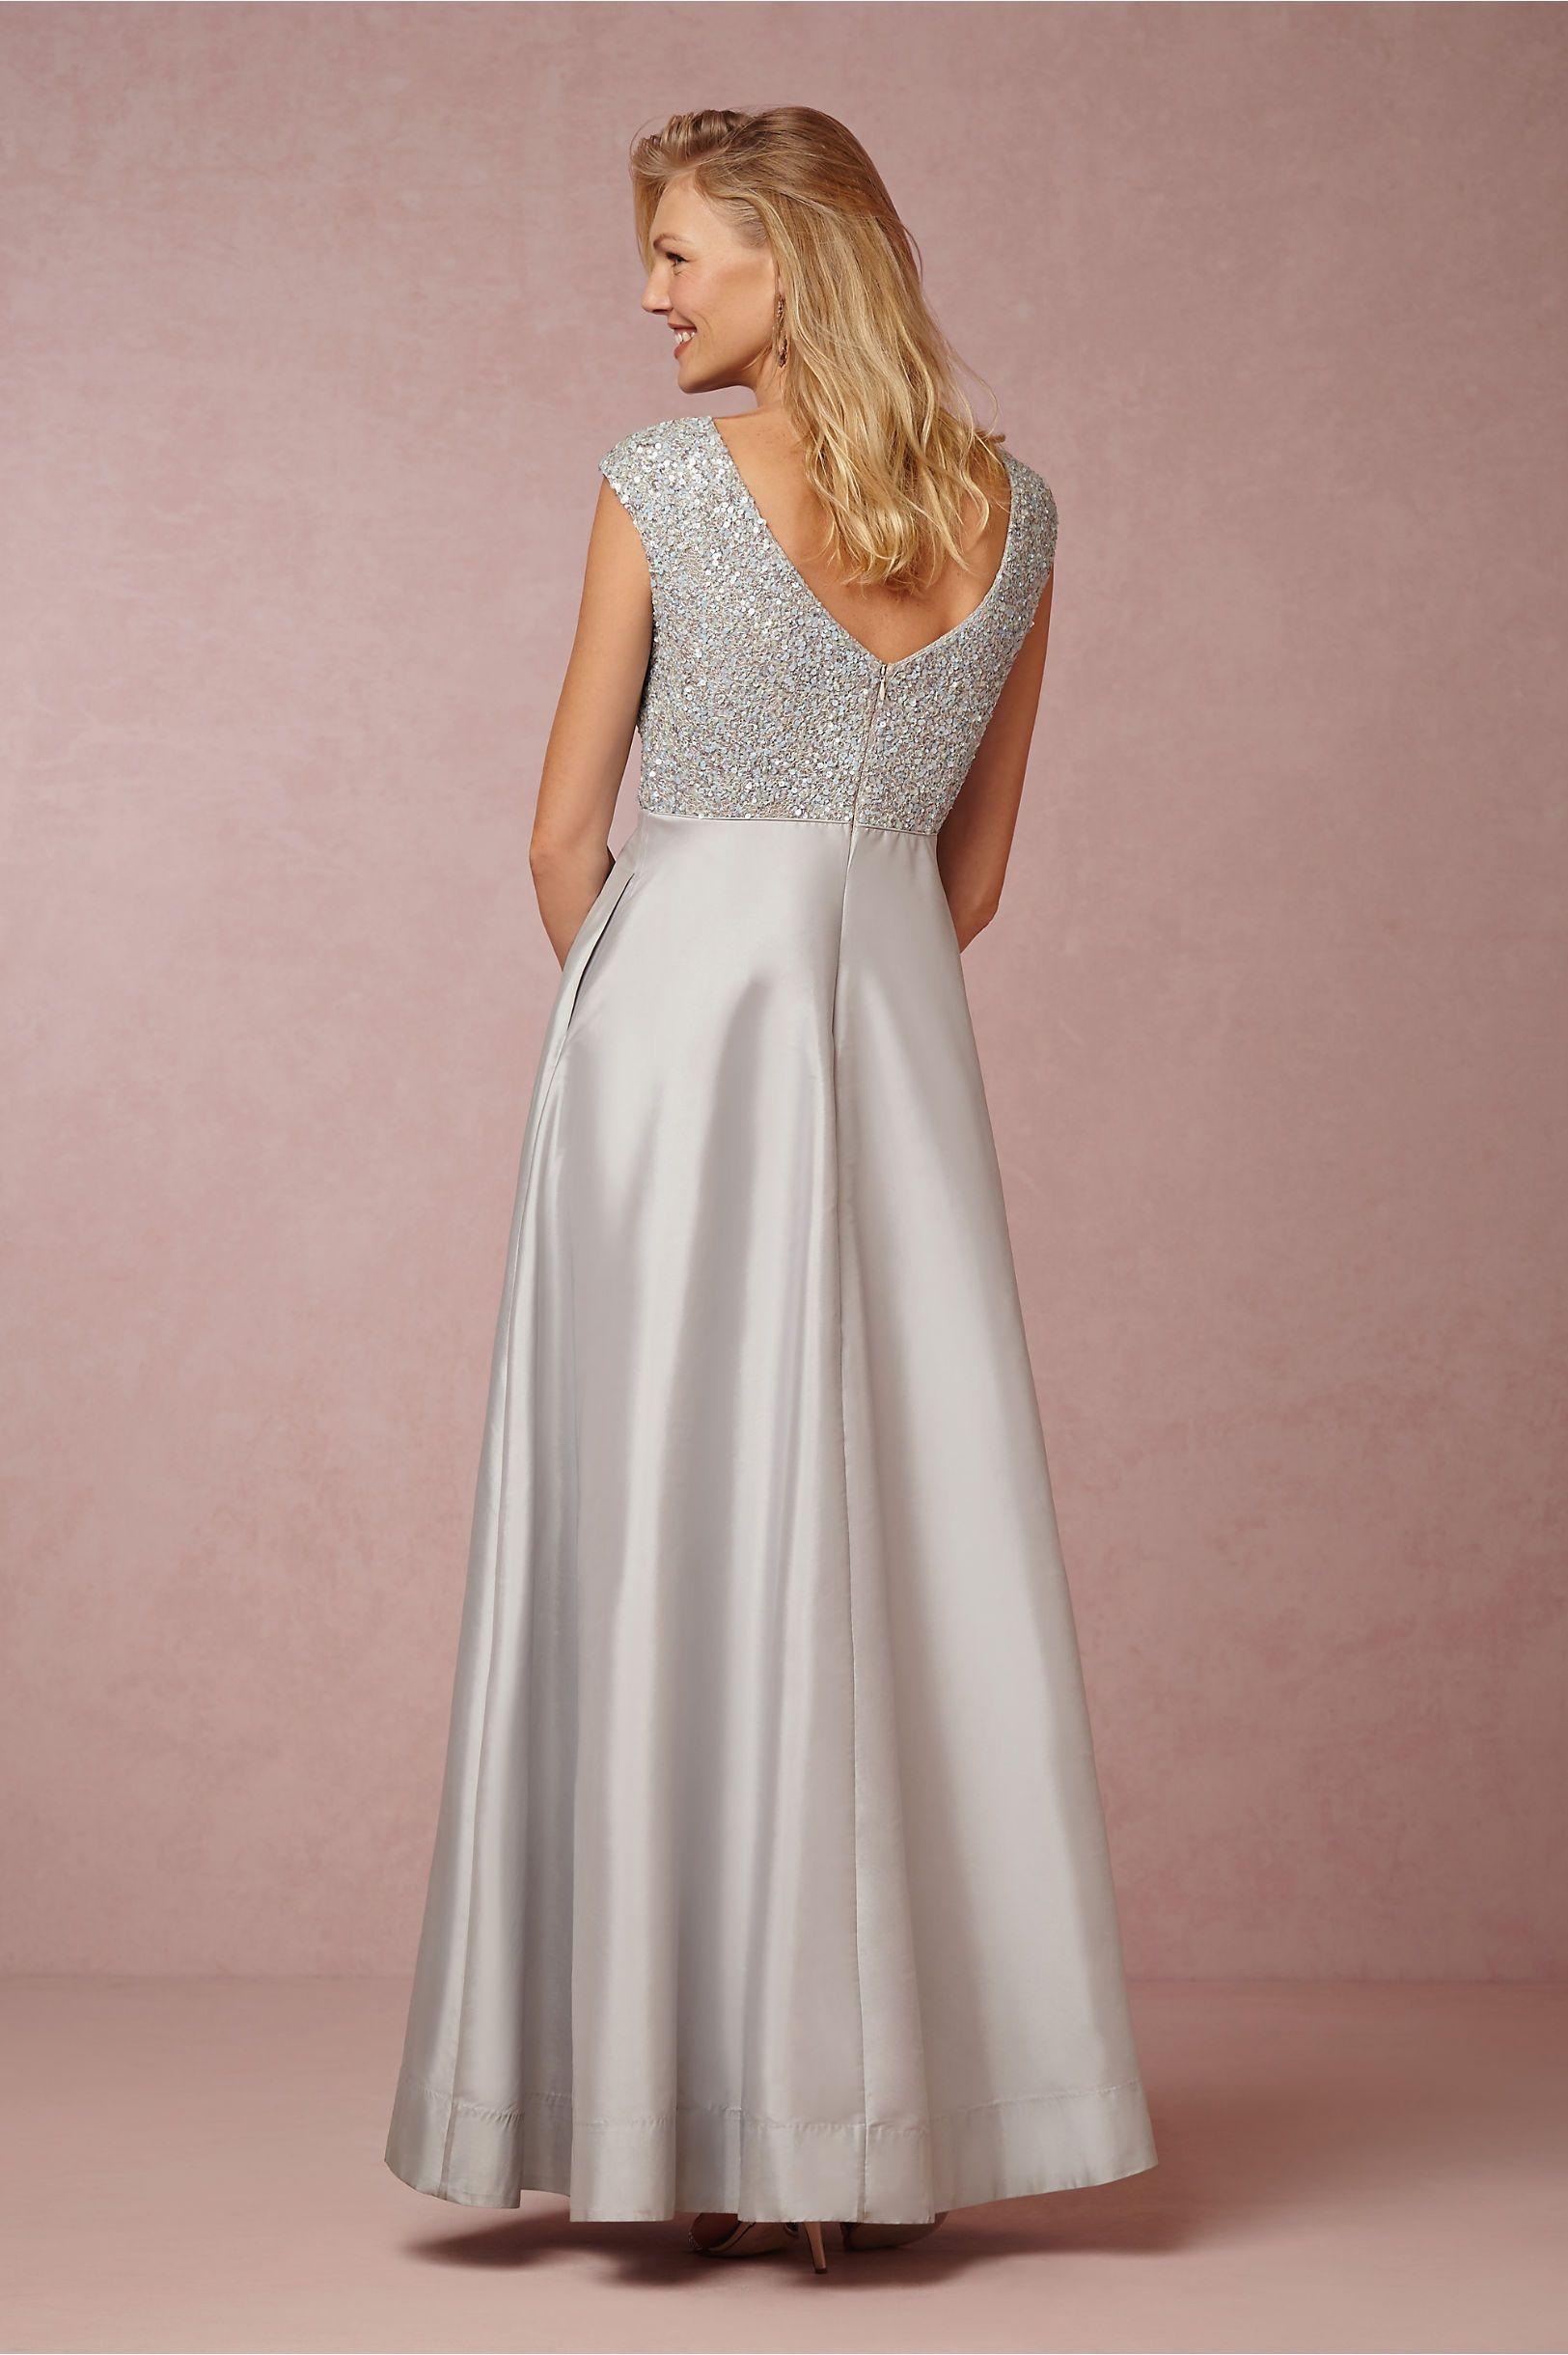 Azalea dress from bhldn wedding hairstyles pinterest